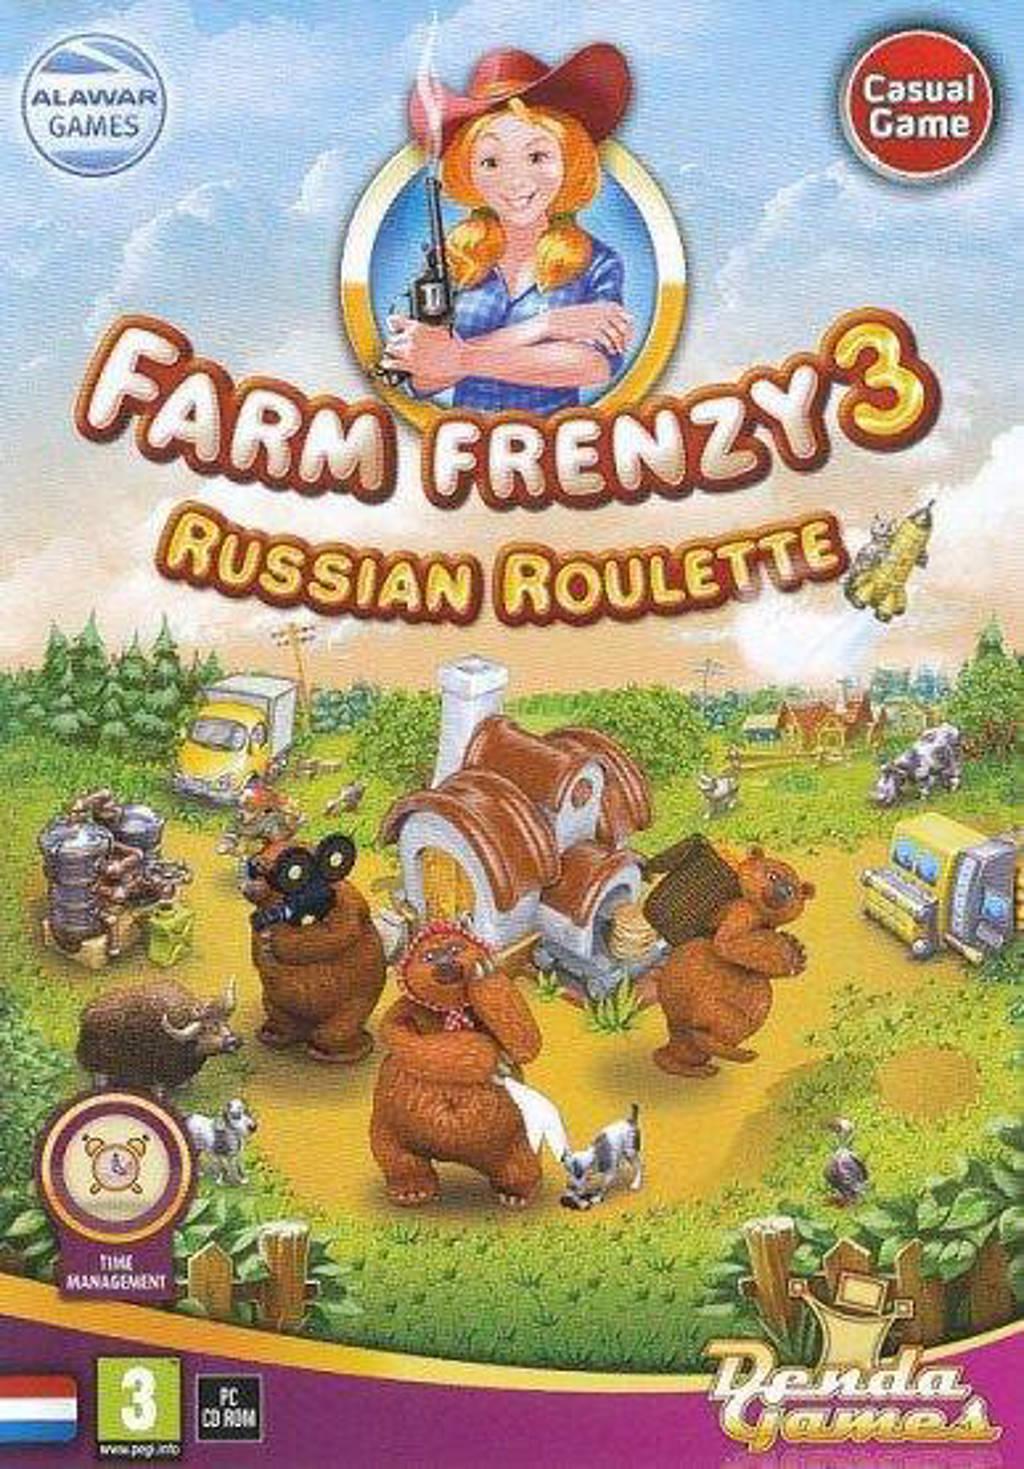 Farm frenzy 3 - Russian roulette (PC)